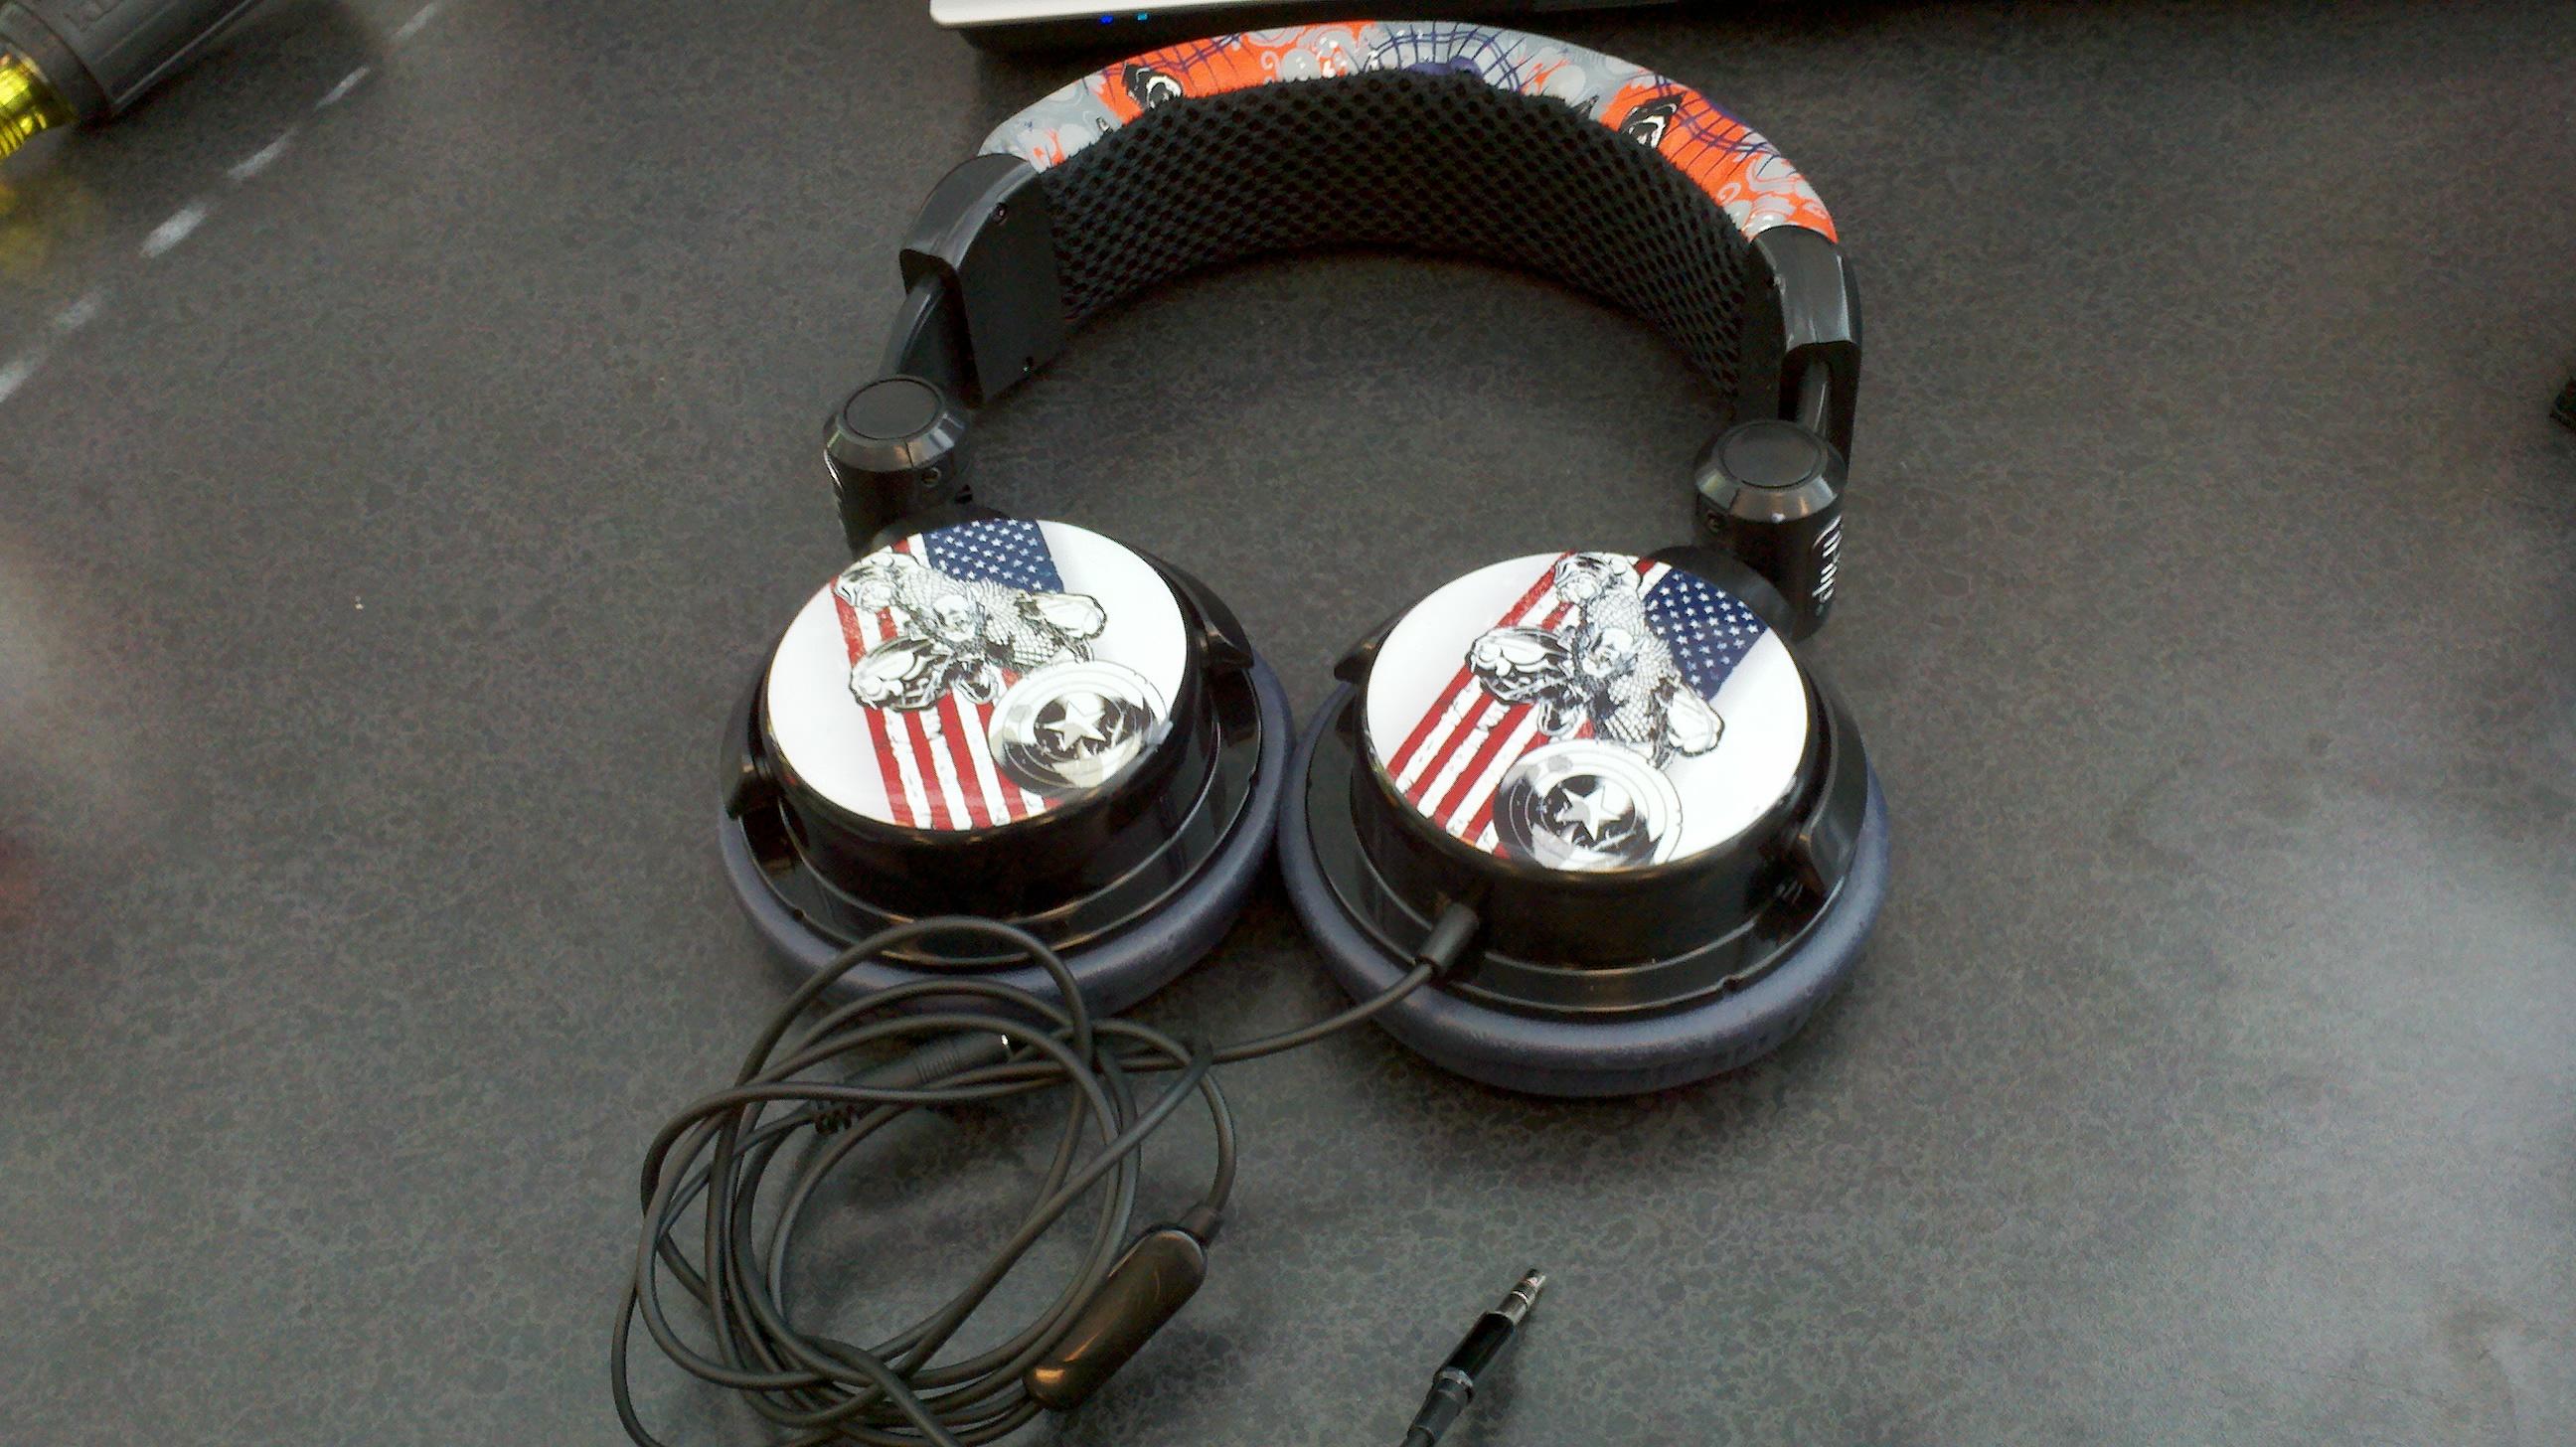 ihip captain america headphone jack repair 6 steps Wireless Microphone Wiring Diagram ihip captain america headphone jack repair